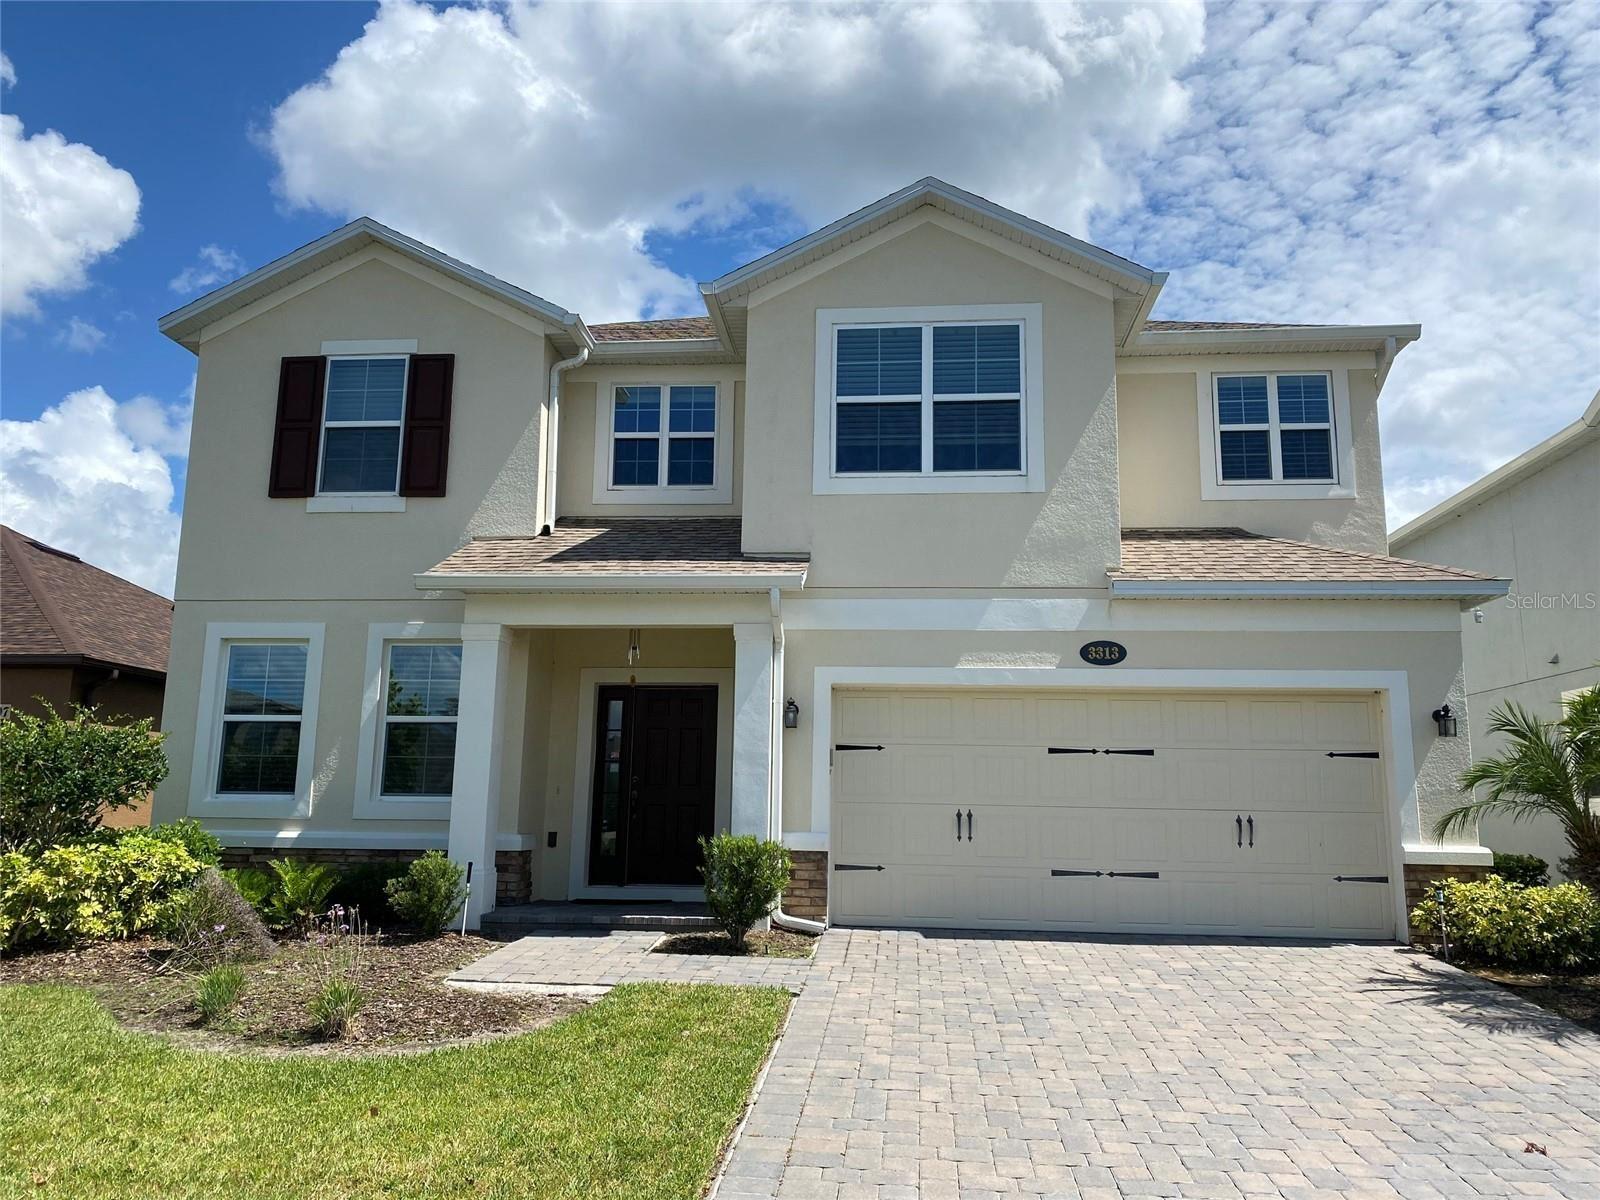 3313 FORTON DRIVE, Orlando, FL 32824 - MLS#: O5950055